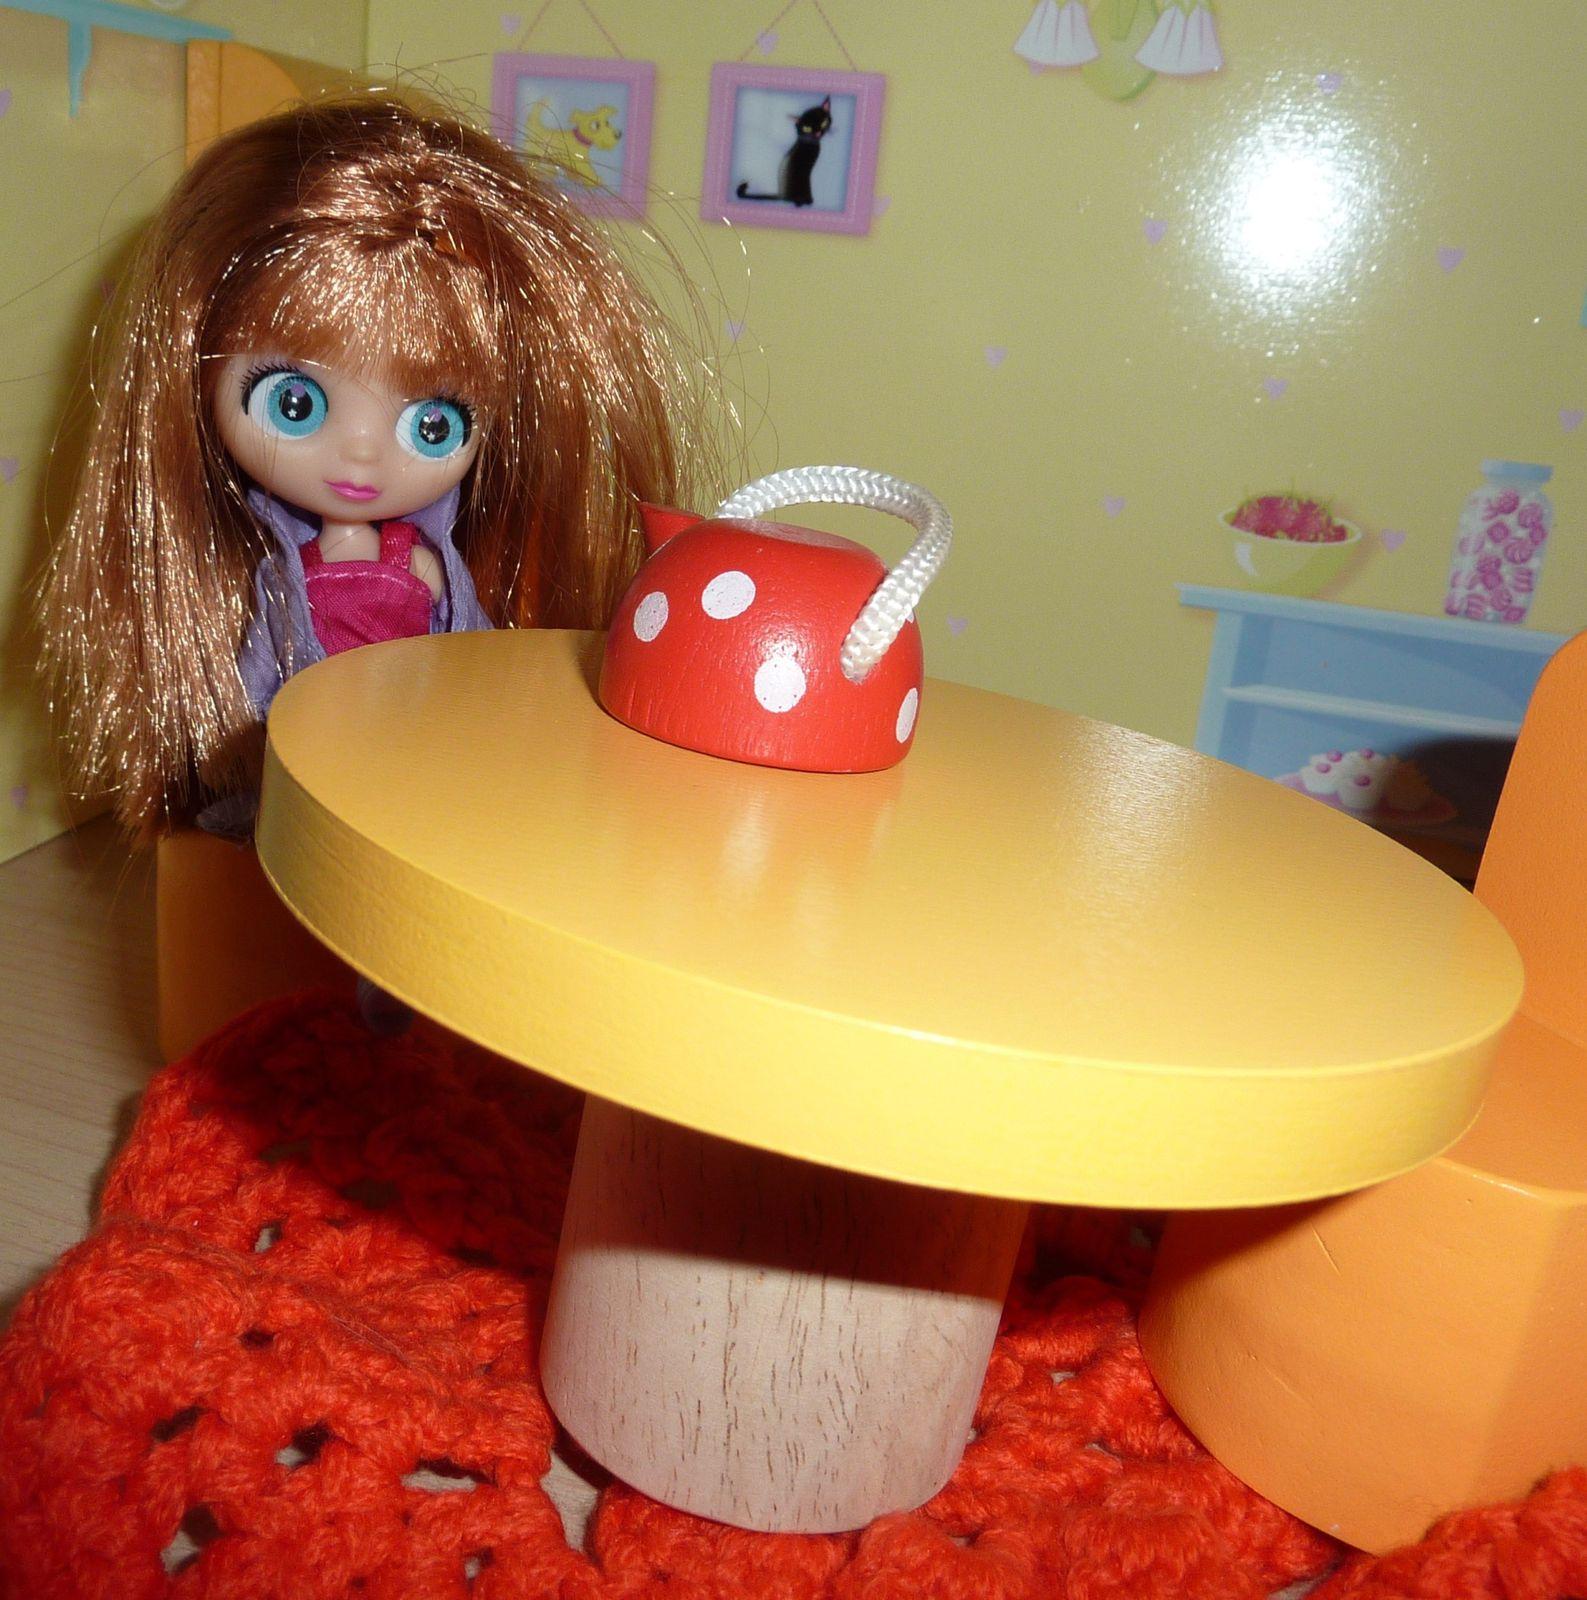 Et Mina toujours en kimono teste le canapé &#x3B;-)